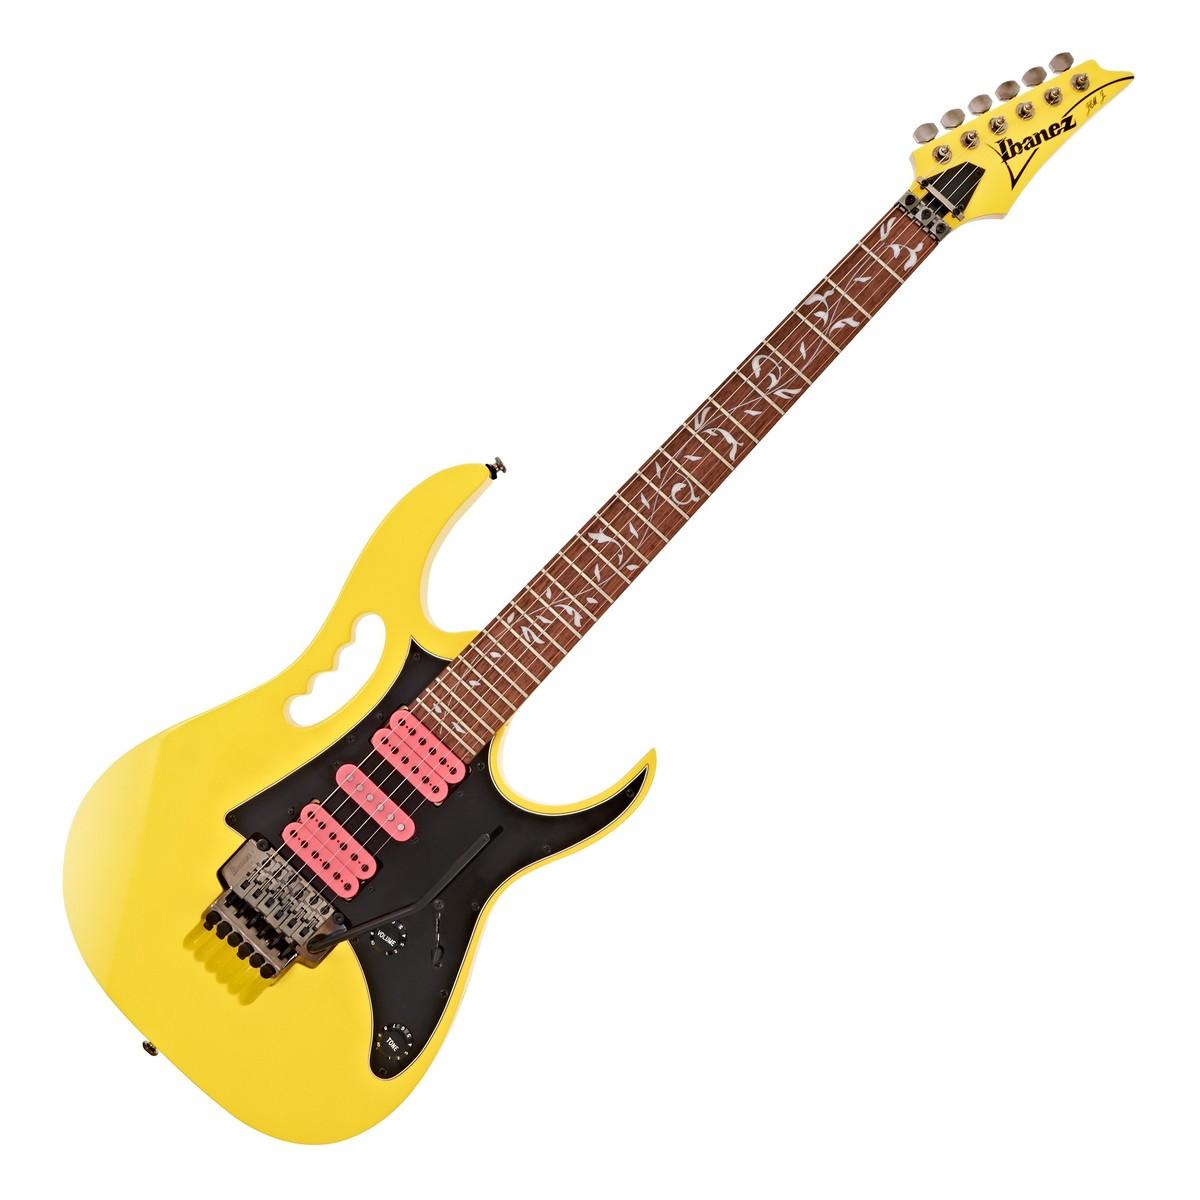 ibanez jem junior steve vai yellow at gear4music. Black Bedroom Furniture Sets. Home Design Ideas